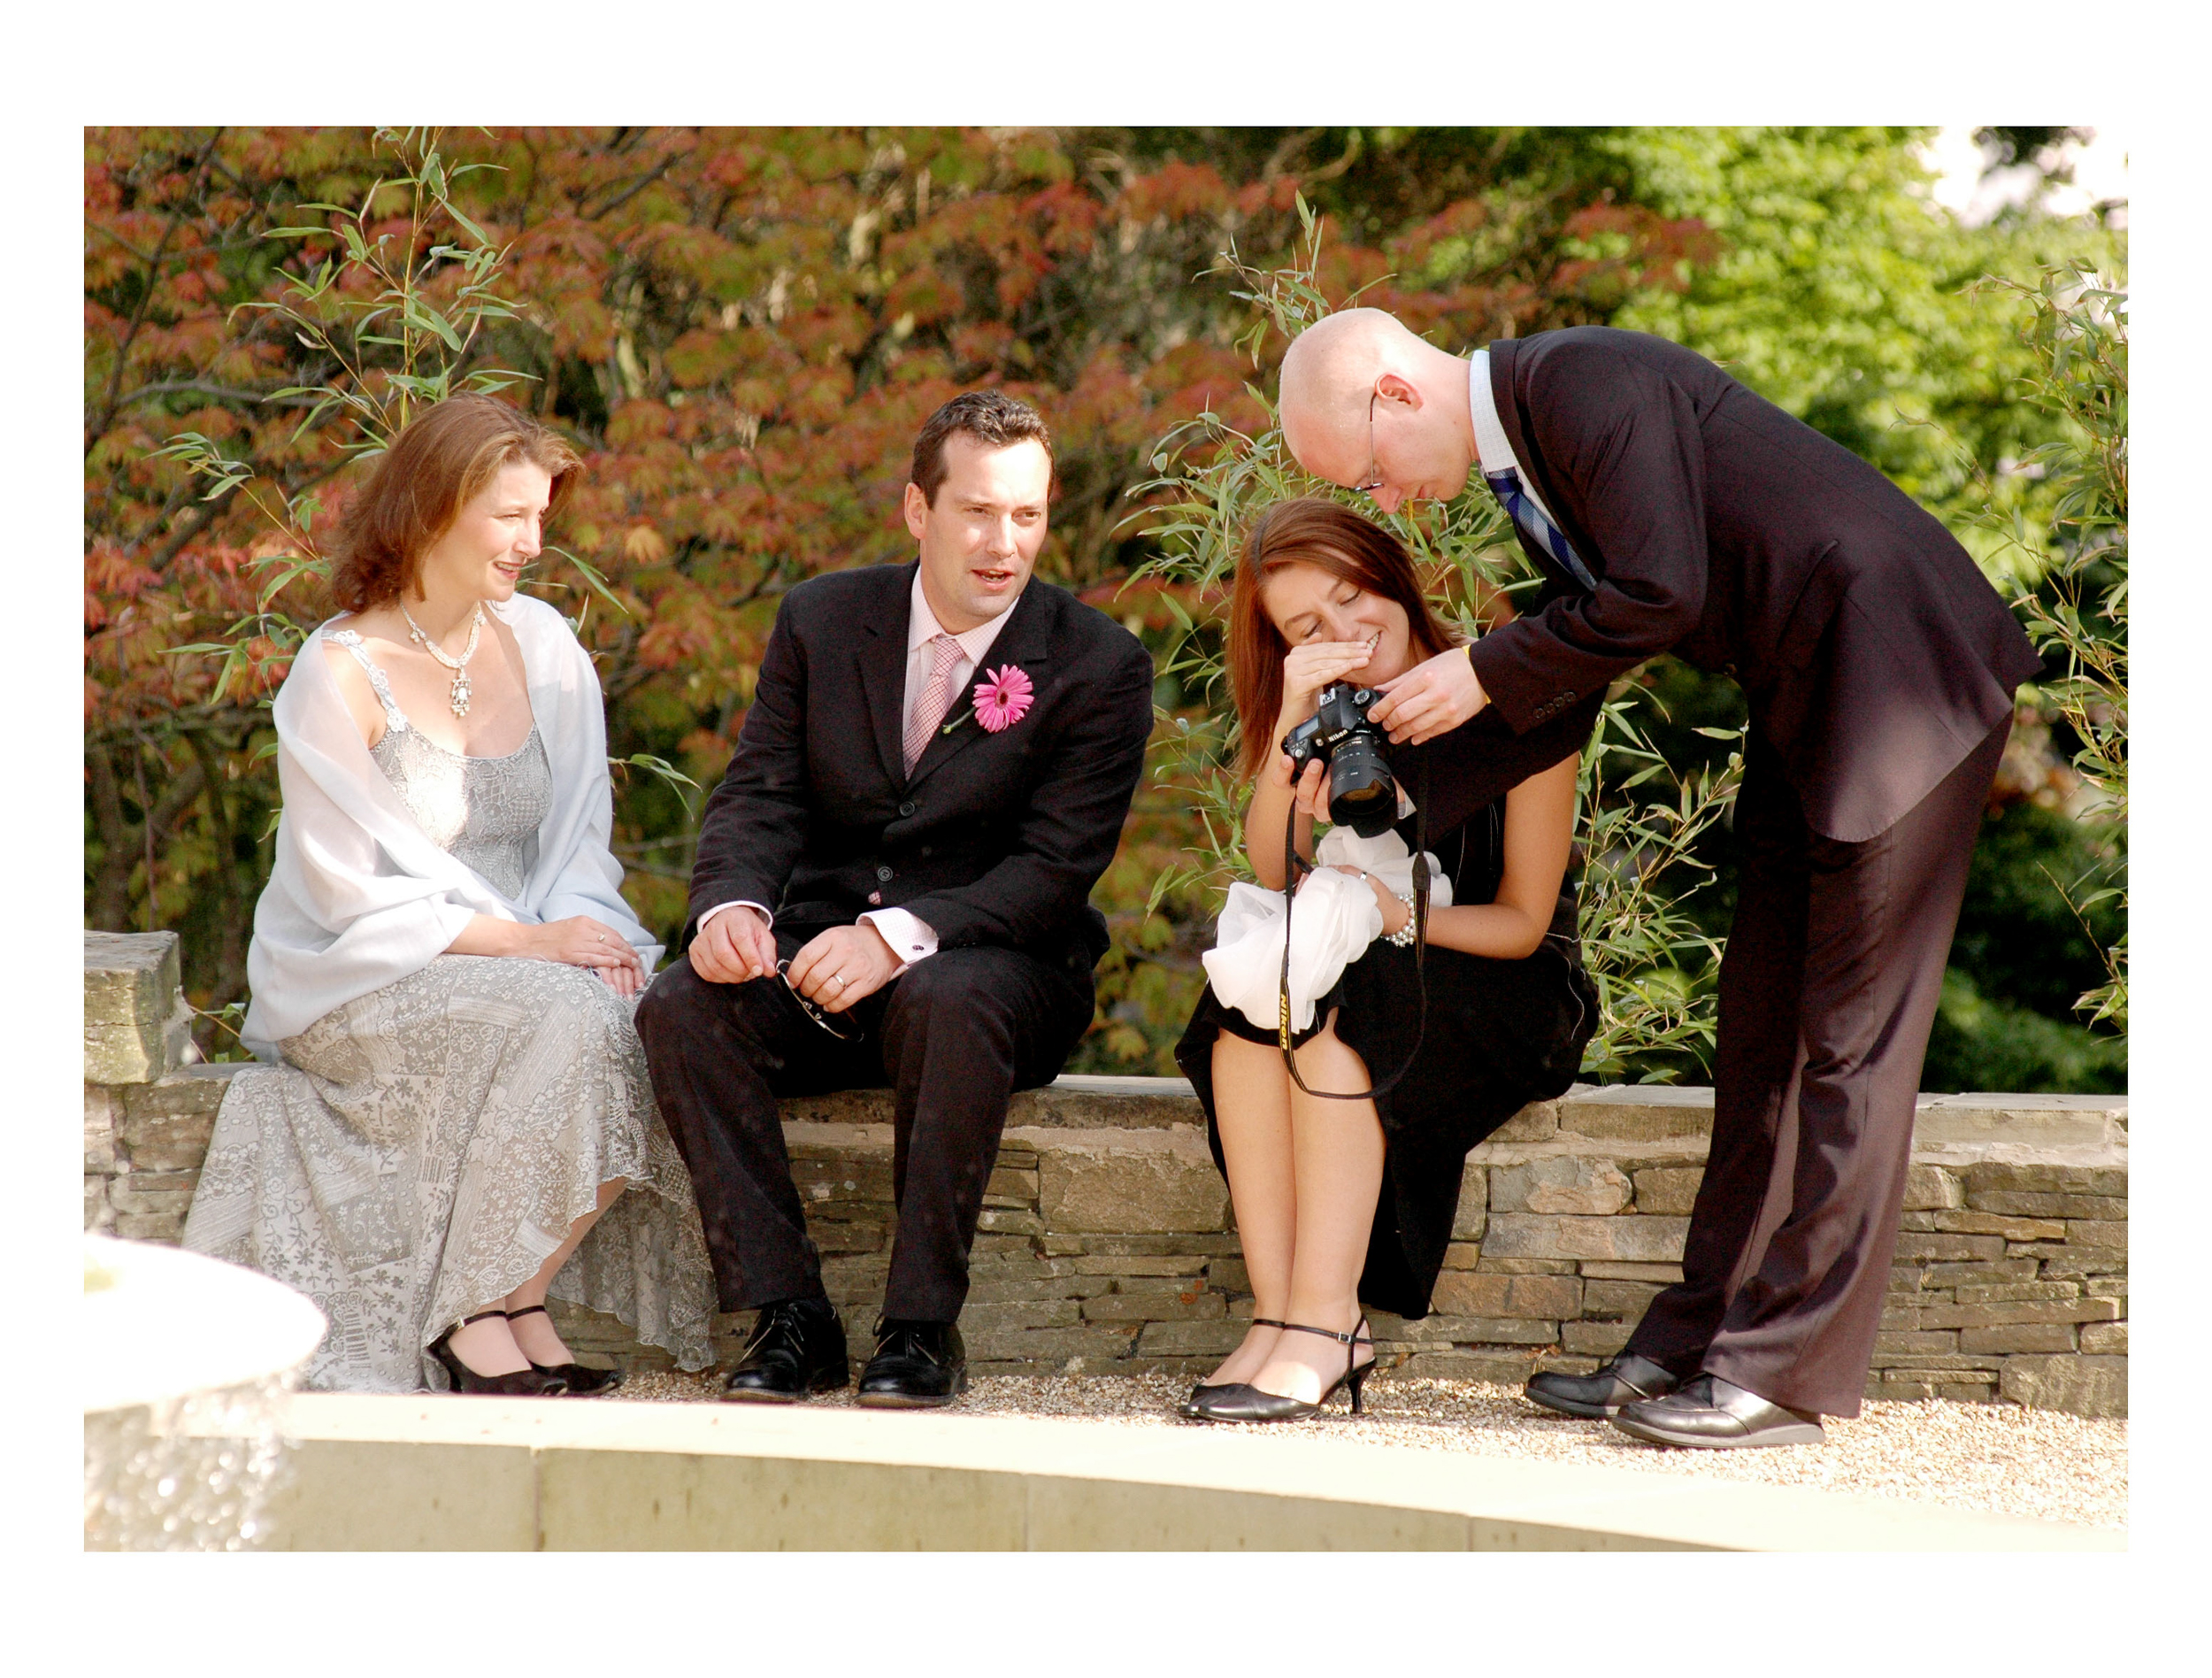 REPORTAGE-WEDDING-PHOTOGRAPHY-SET-UK-31.jpg